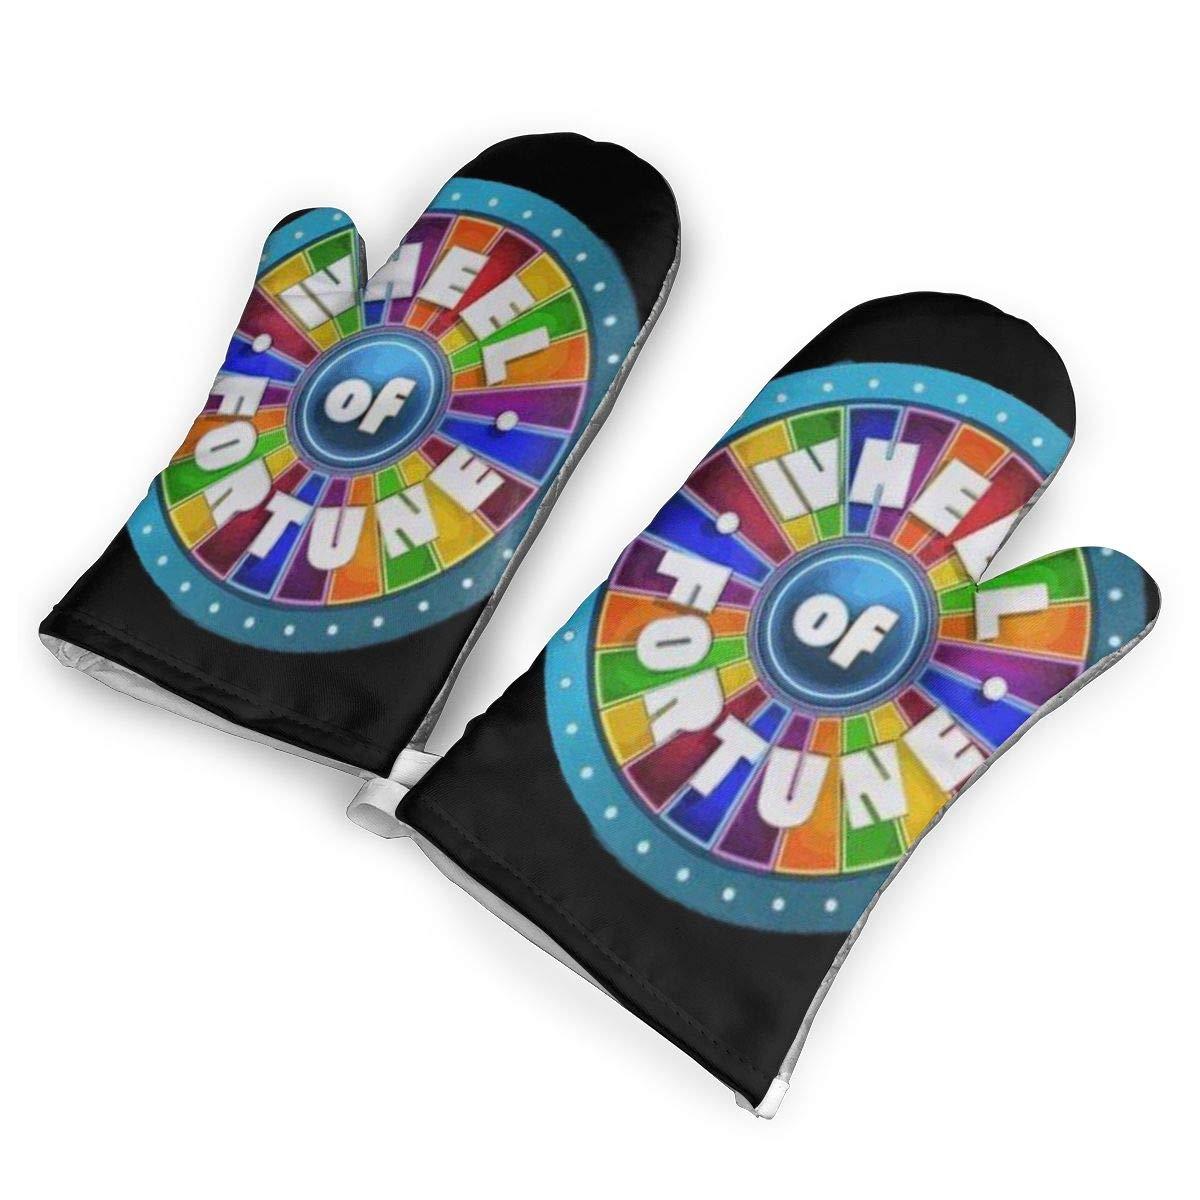 CASM Wheel of Fortune Sony Pictures Studios Unique Design Eyeballs.jpg Microwave Oven Gloves,Cotton Oven Gloves Heat Resistant Microwave Oven Kitchen Gloves